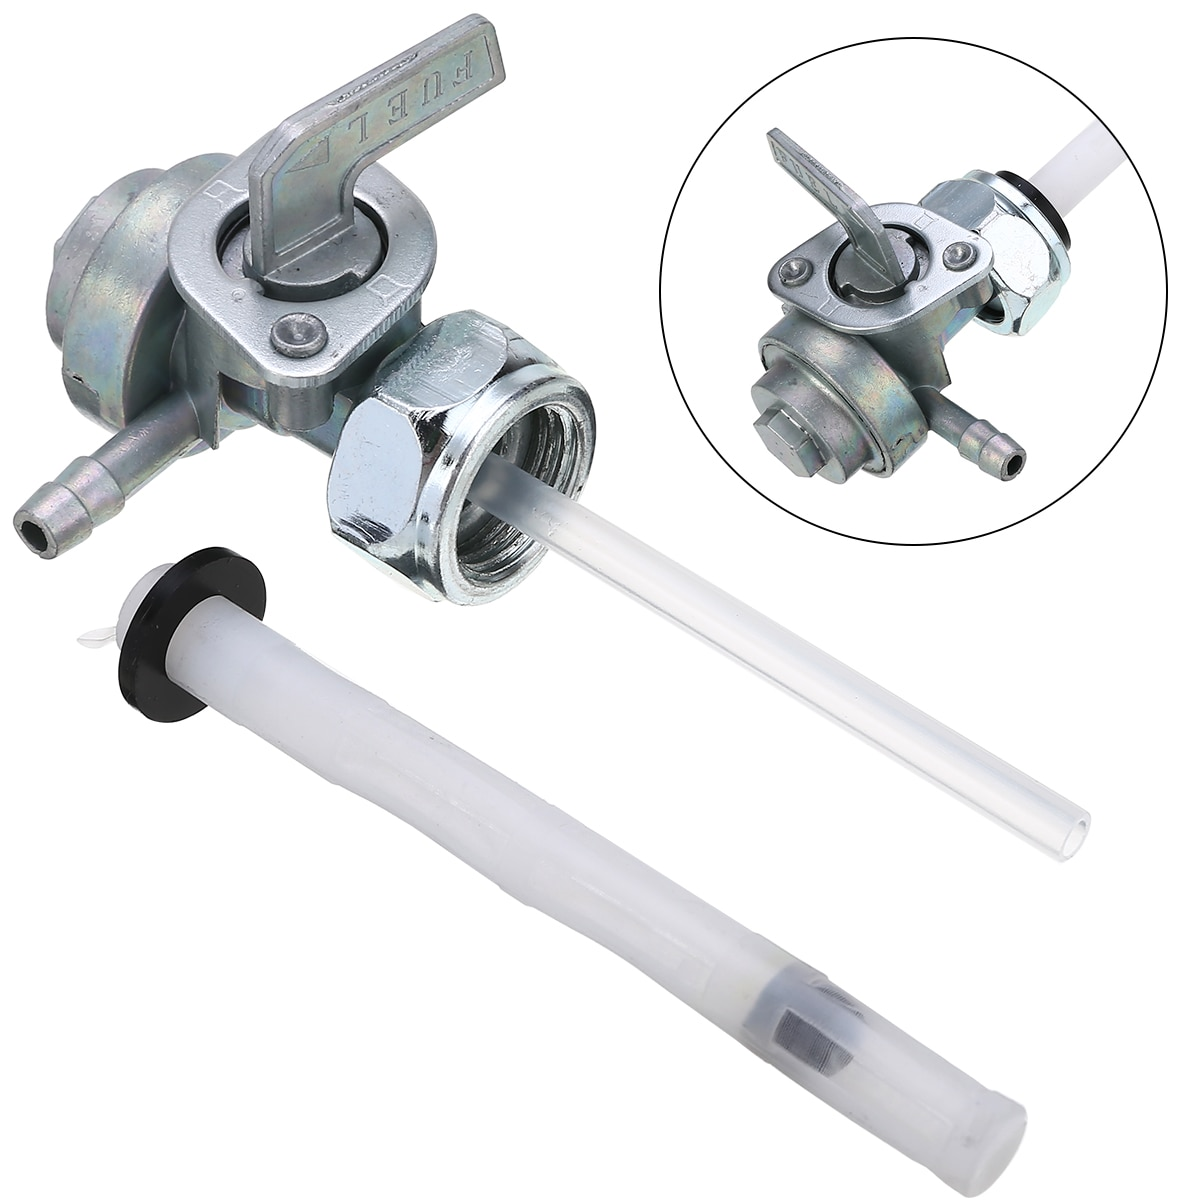 Universal 1pc para depósito de gasolina de motocicleta interruptor llave válvula llave rosca para Honda Super Sport Hondamatic